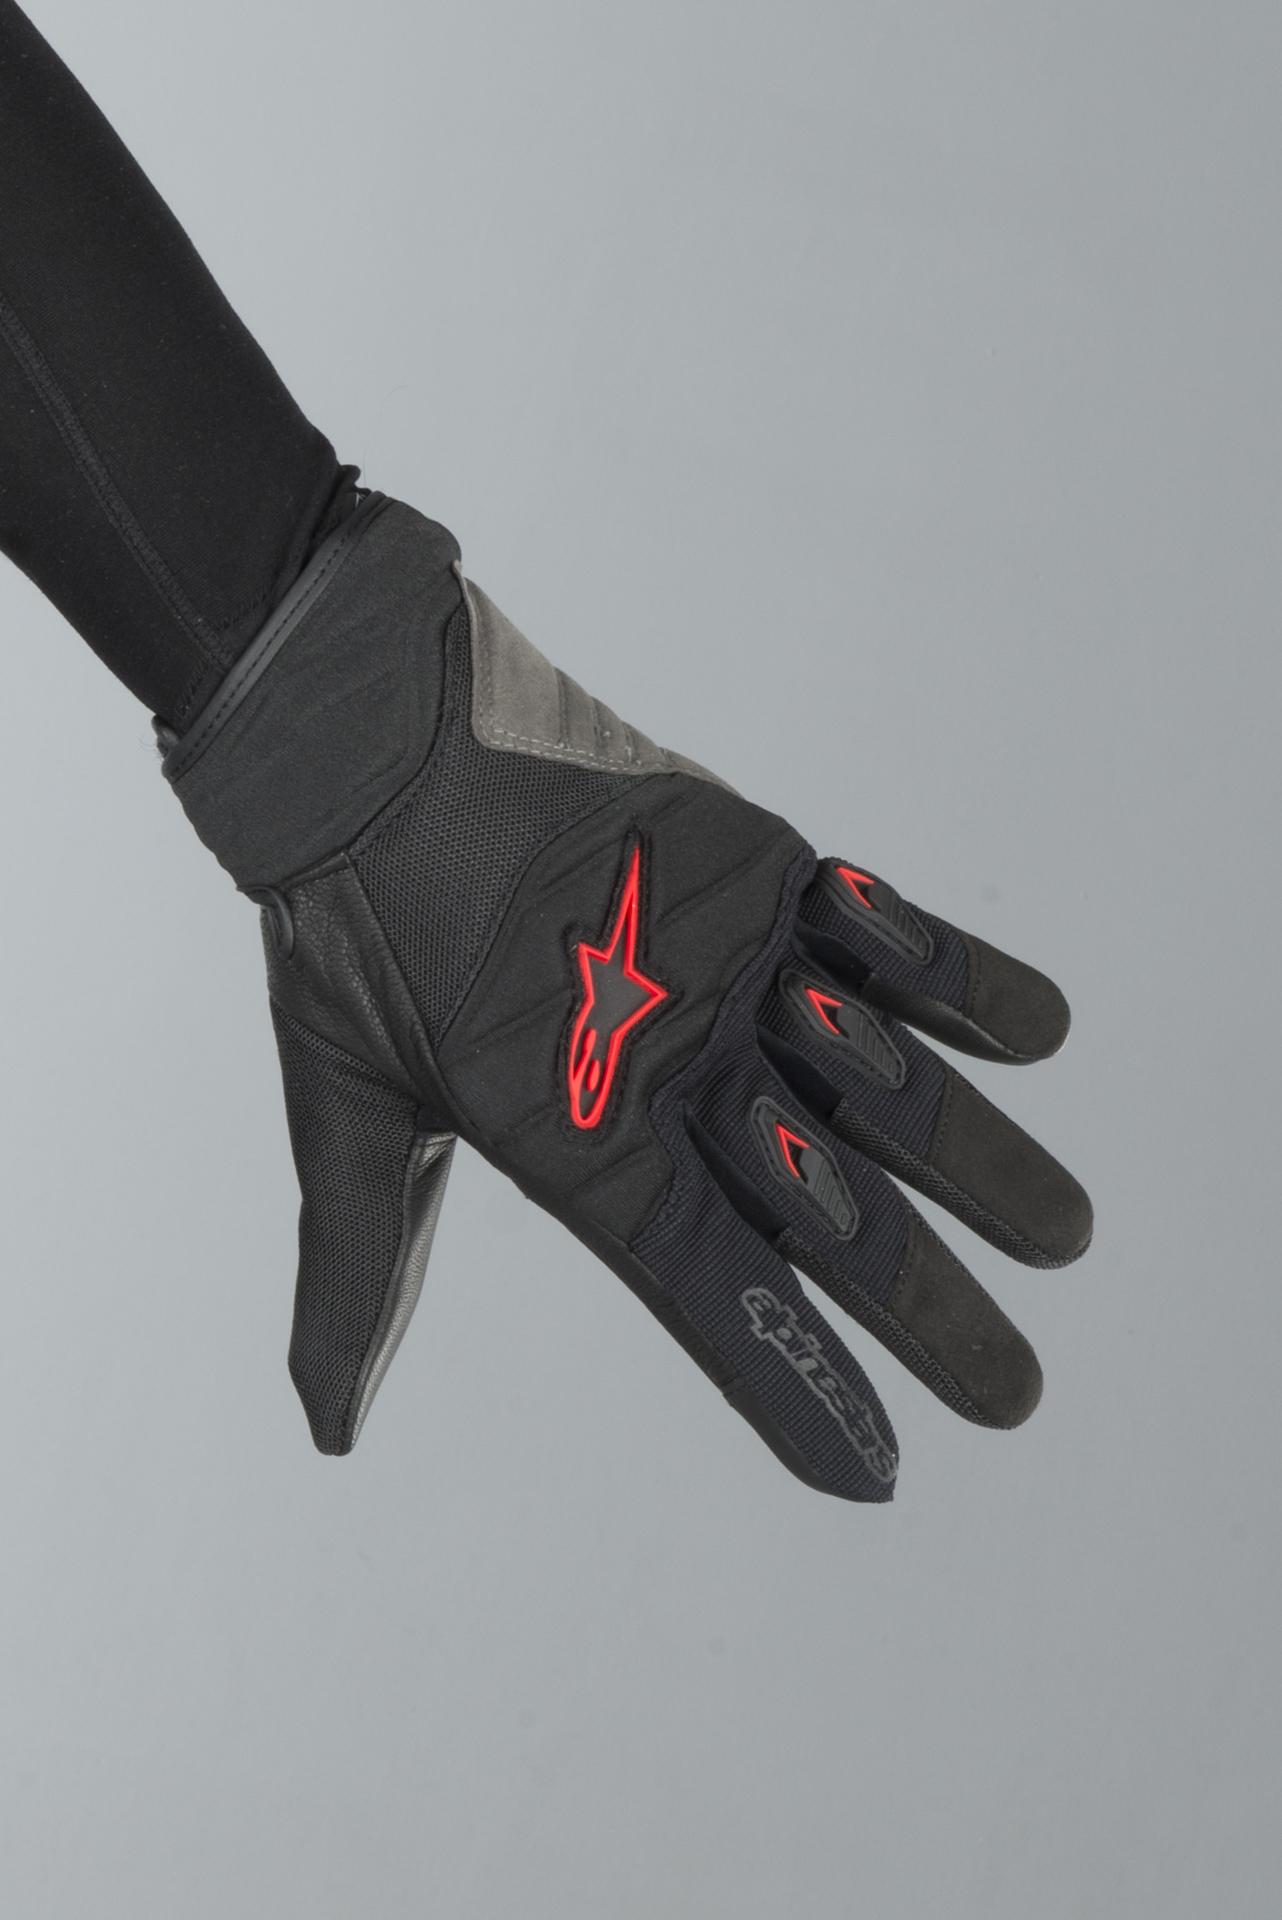 S Black Motorcycle gloves Alpinestars Shore Gloves Black